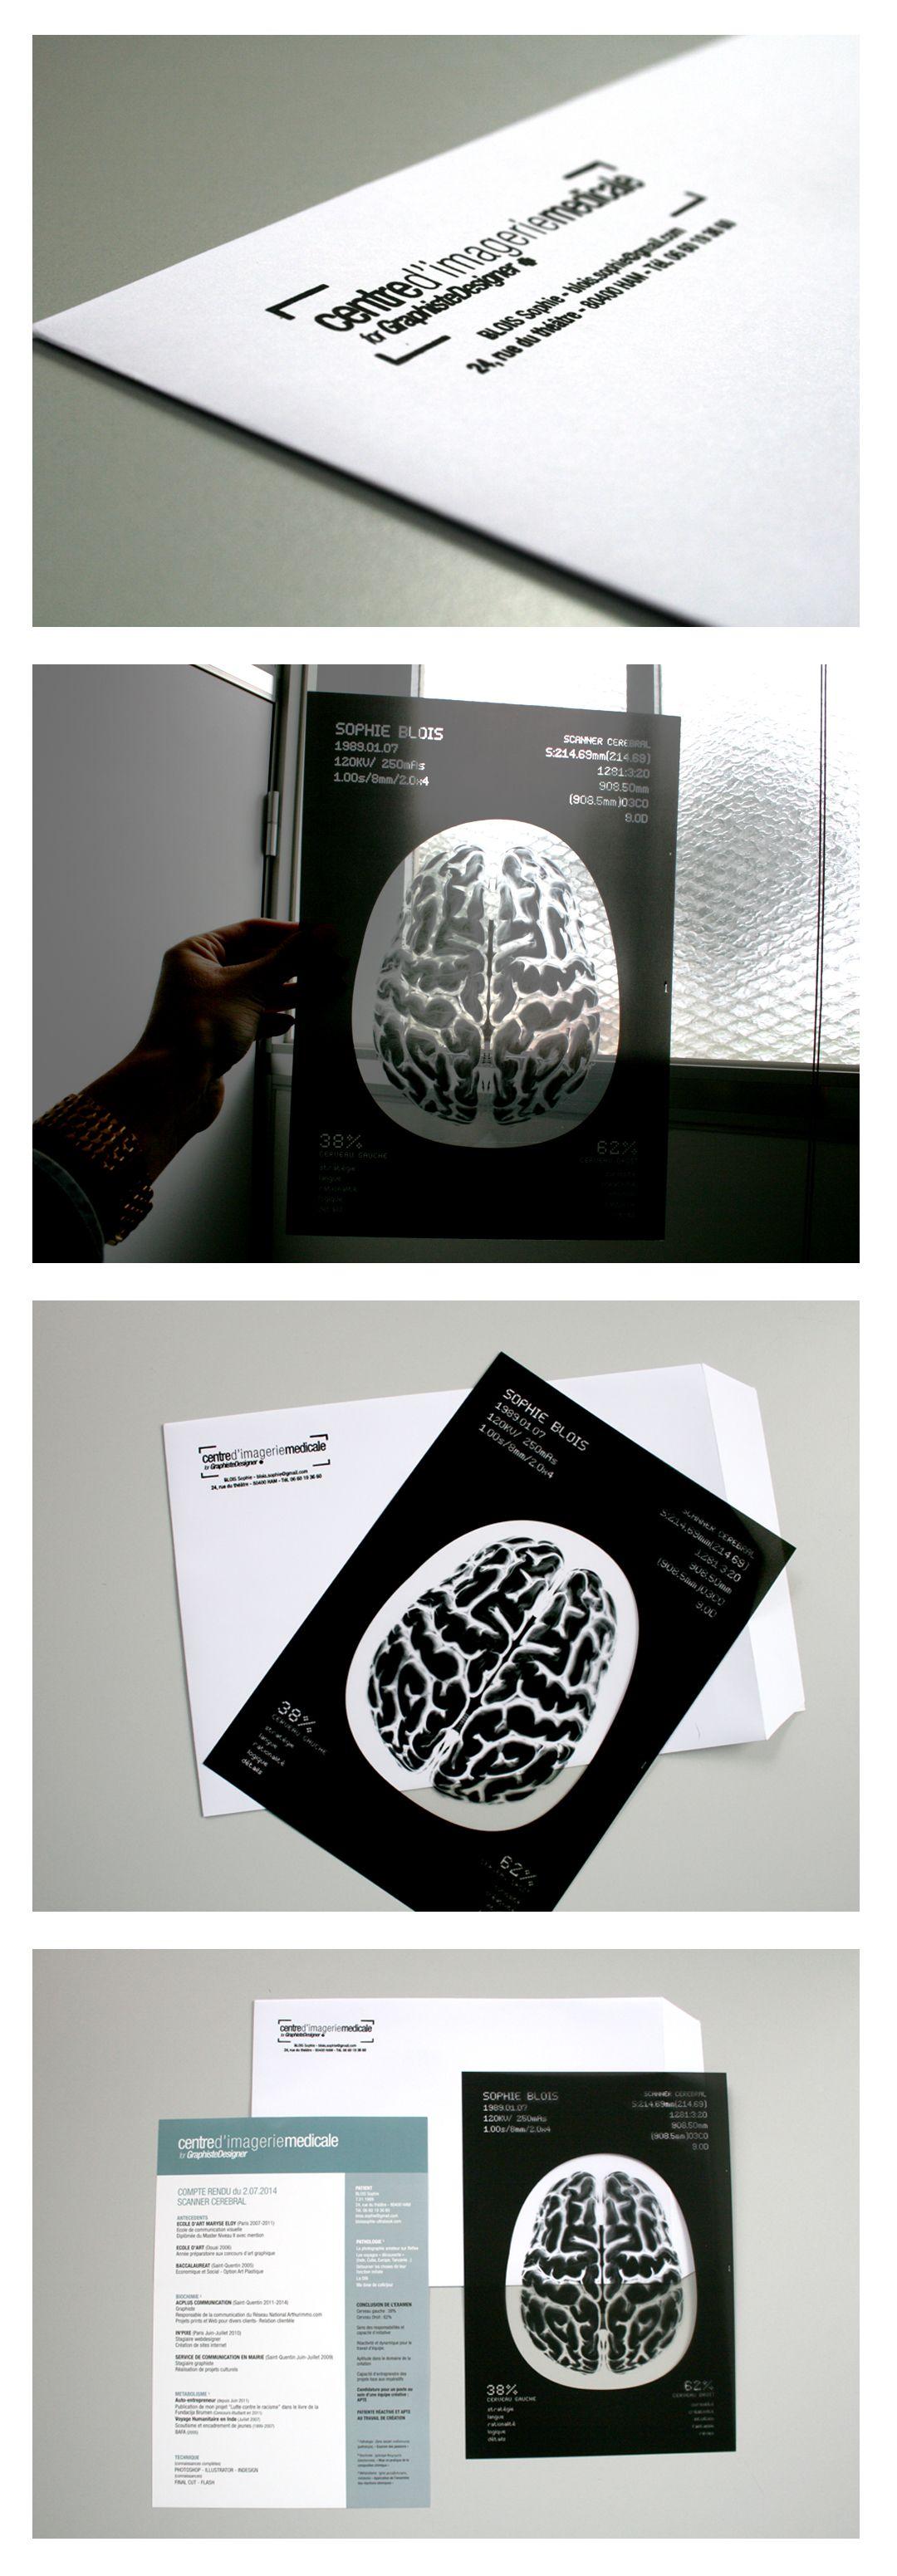 Centre Dimagerie Medicale For Graphiste Designer Carte De Visite Design Graphique